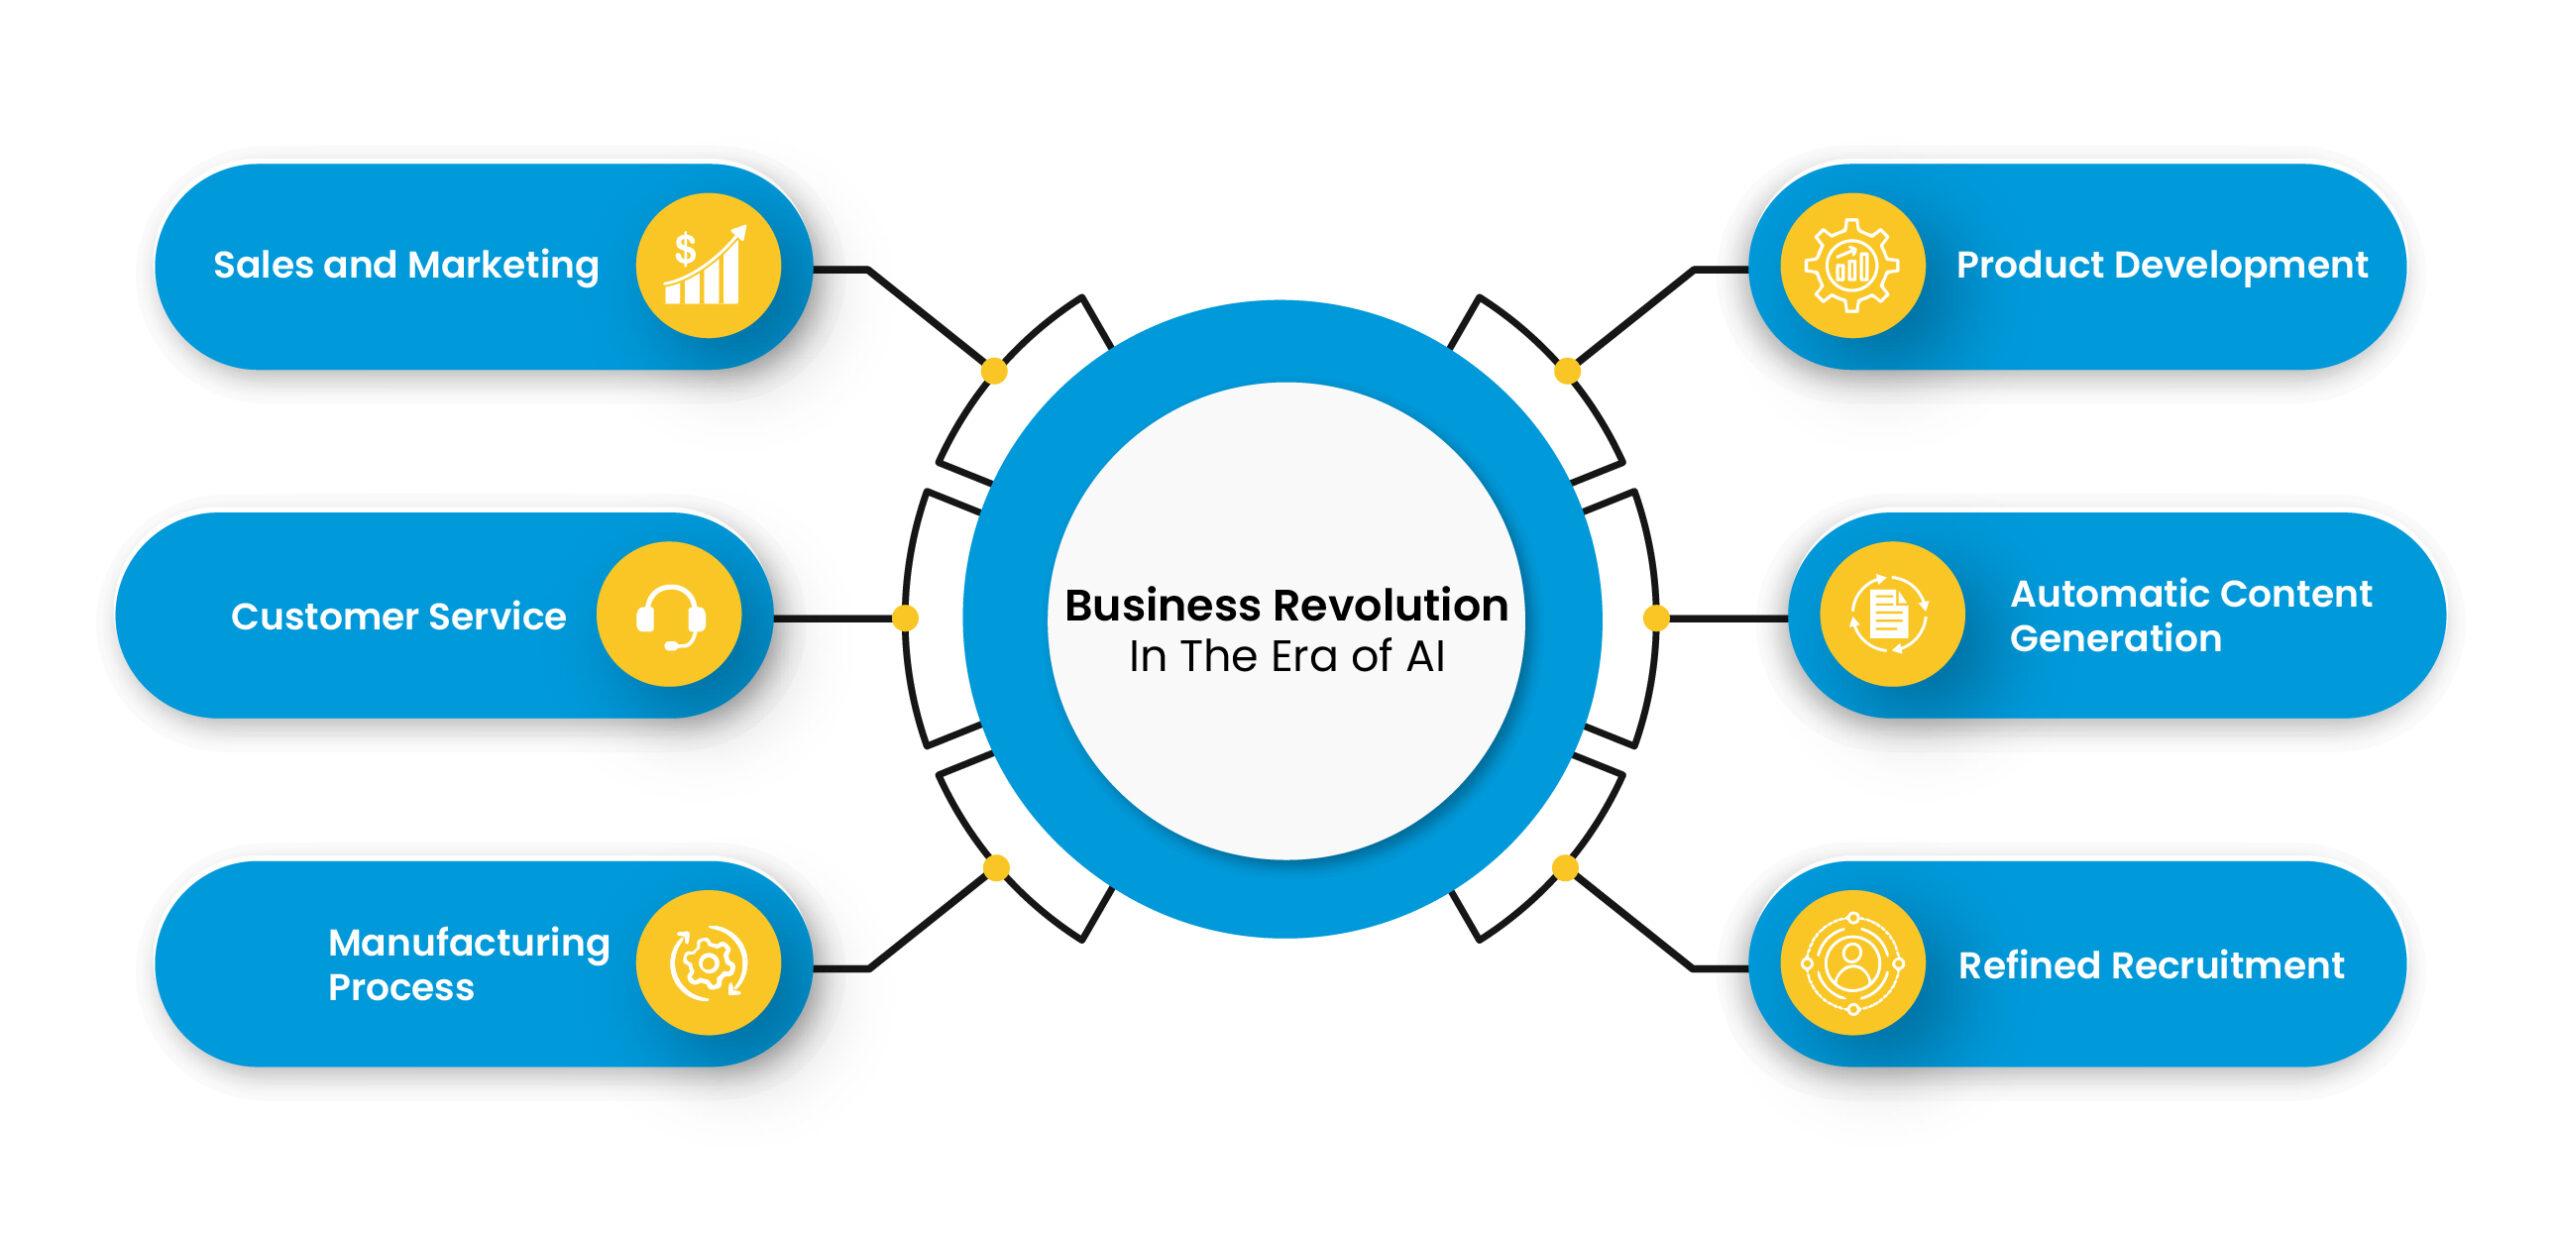 Business Revolution in The Era of AI